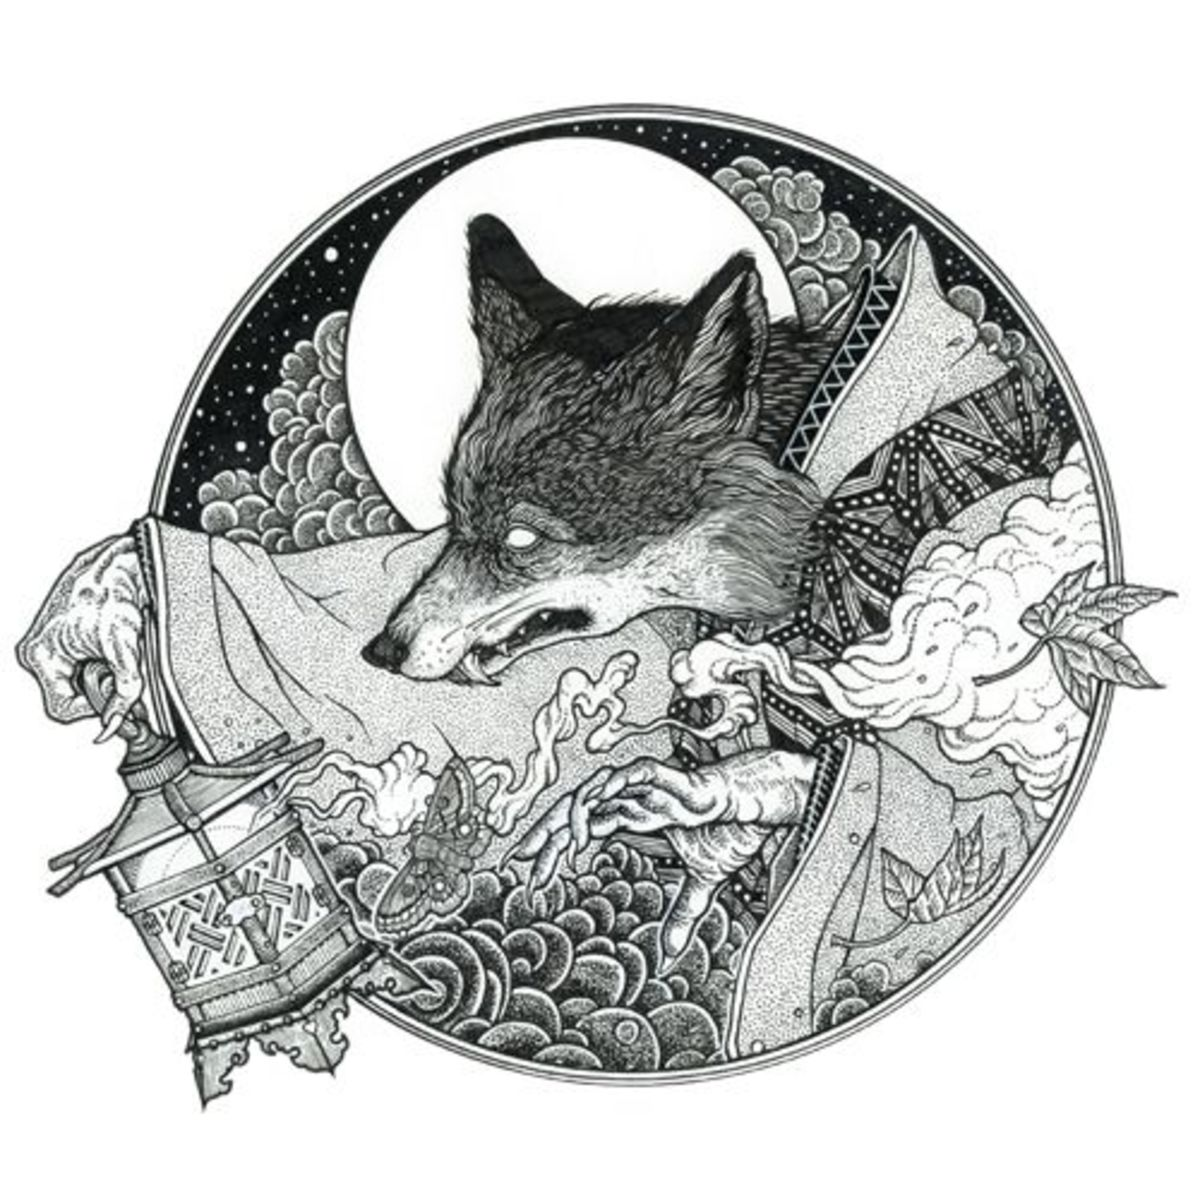 Kitsune Tattoos Origins Meanings Types Of Japanese